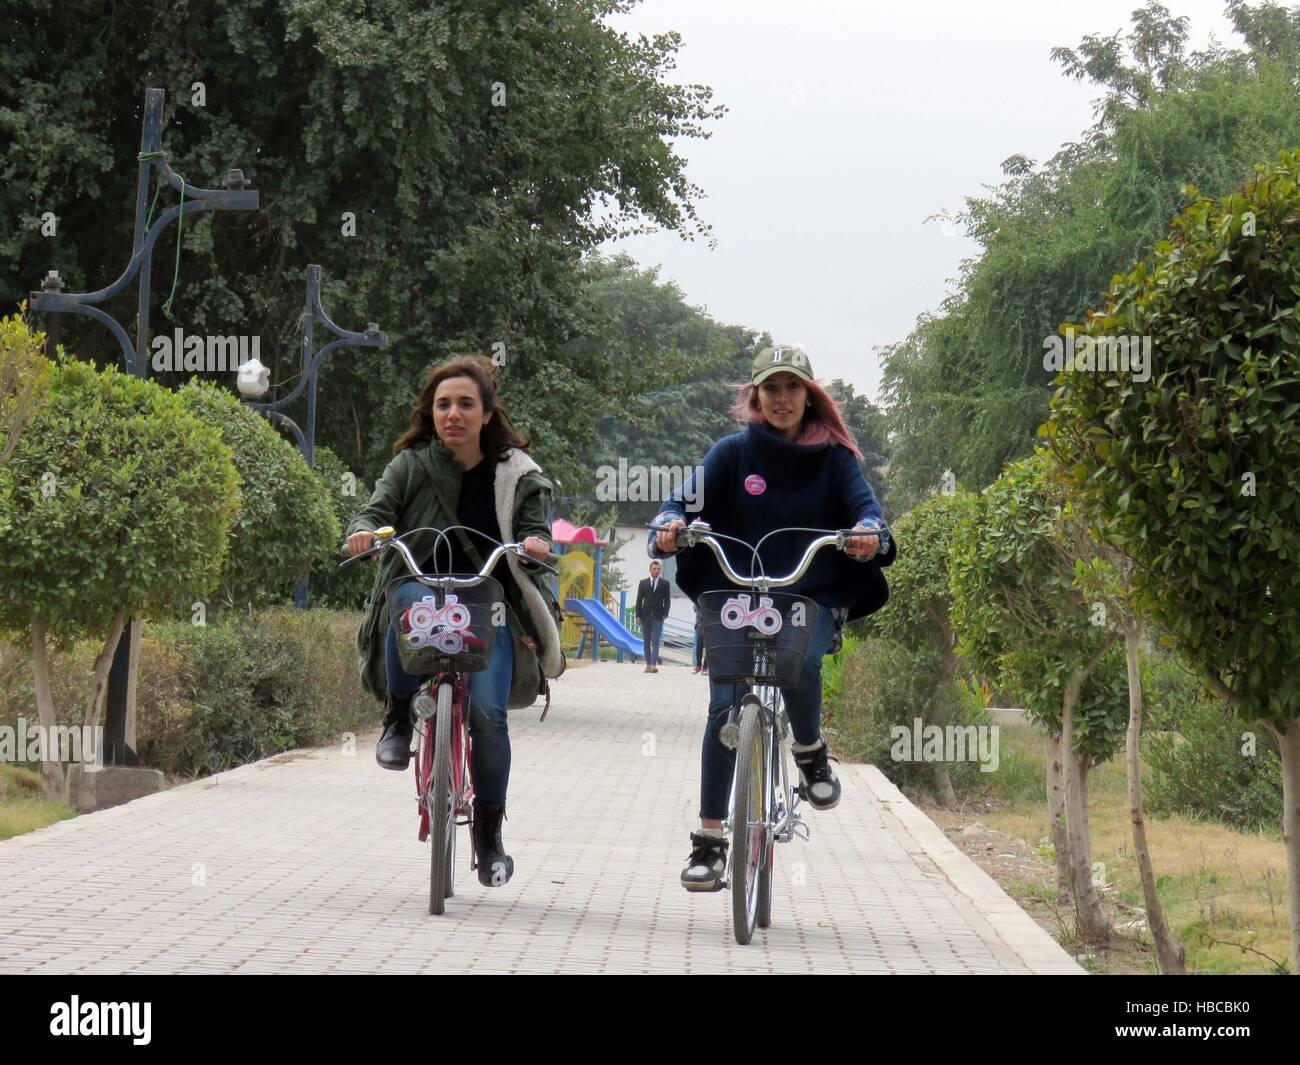 Baghdad in Iraq. 5 Dic, 2016. Due donne irachene in bici sull'Abu Nawas street durante una manifestazione ciclistica Immagini Stock